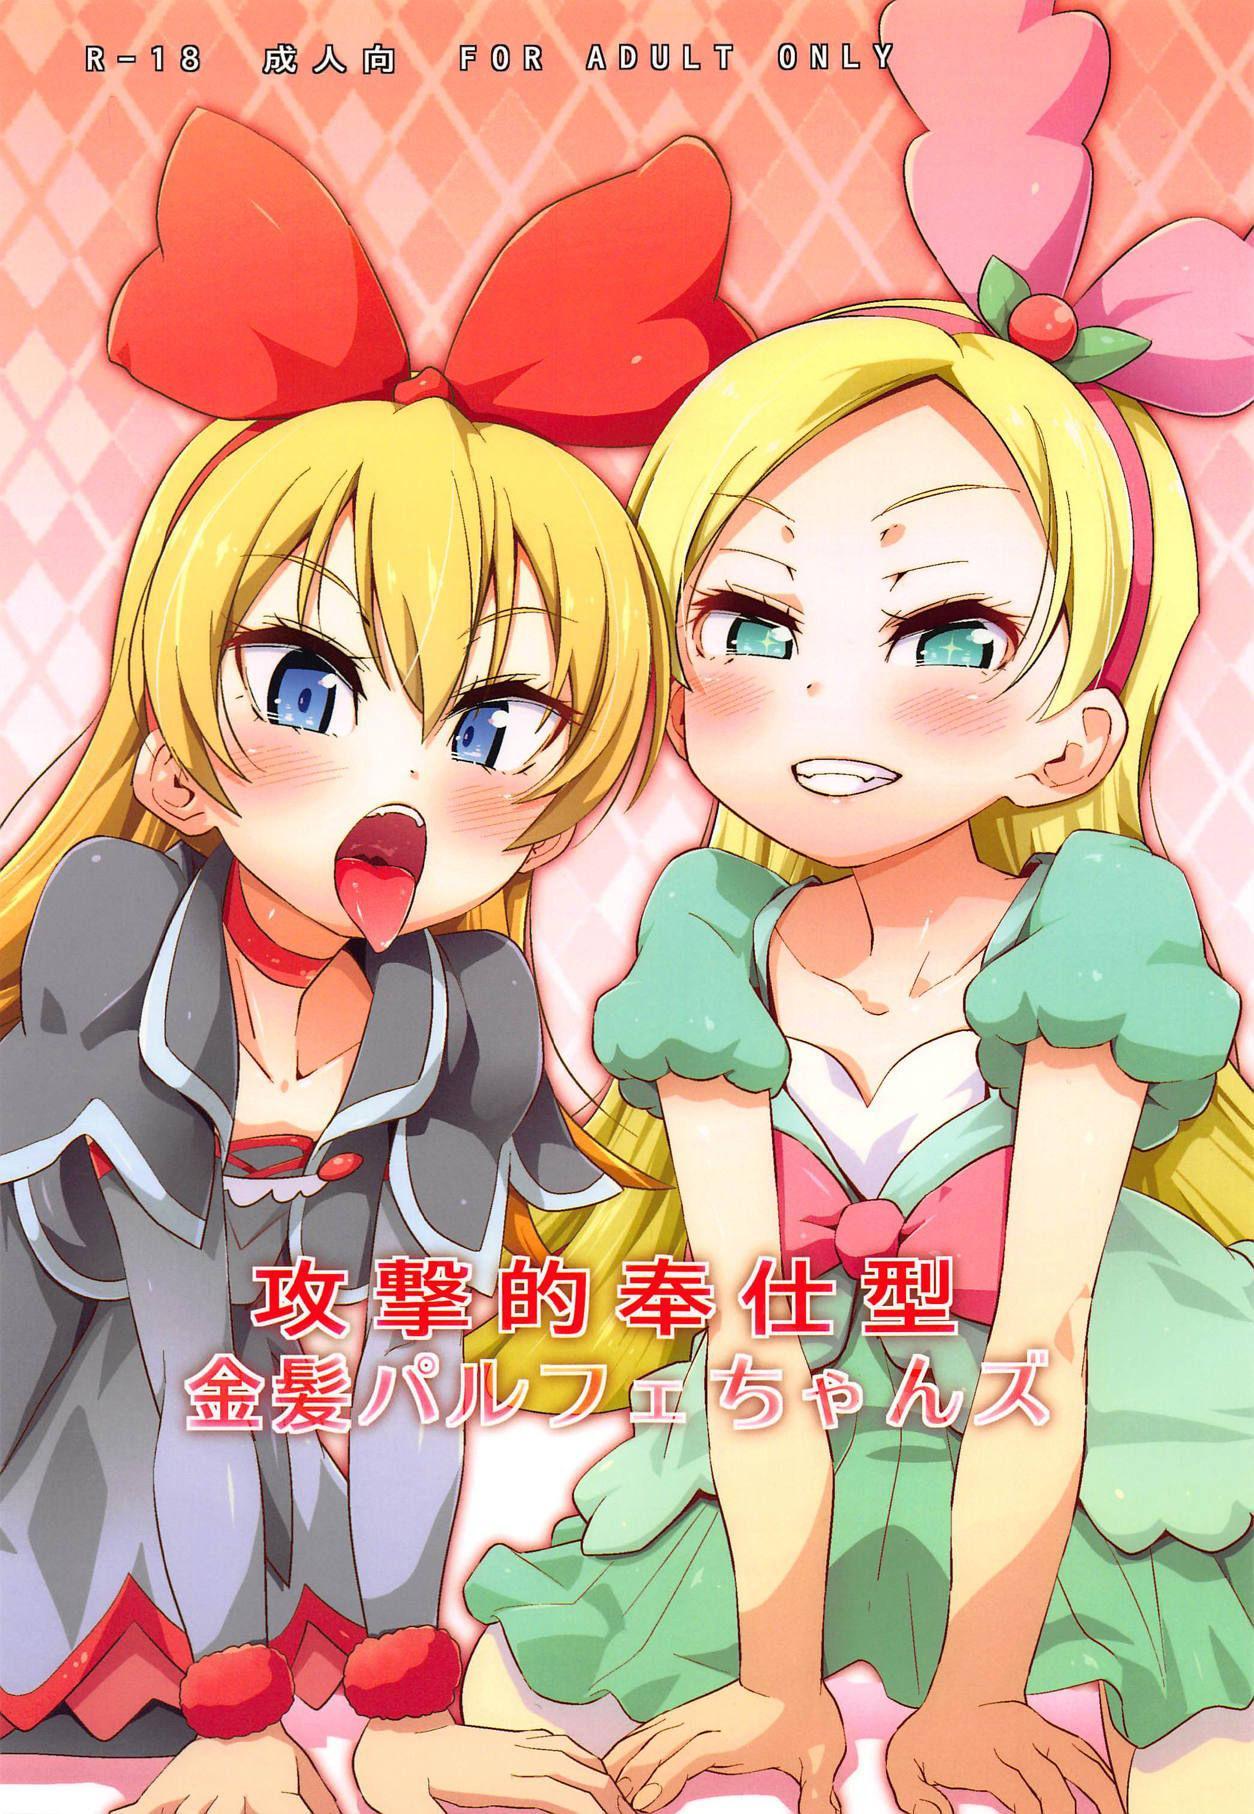 (C94) [CLUTCH SHOT KING (Kakkuu)] Kougekiteki Houshigata Kinpatsu Parfait-chans   Aggressive Servicing Blonde Parfait-chans (Dokidoki! PreCure, Kirakira PreCure a la Mode) [English] {Doujins.com} 0